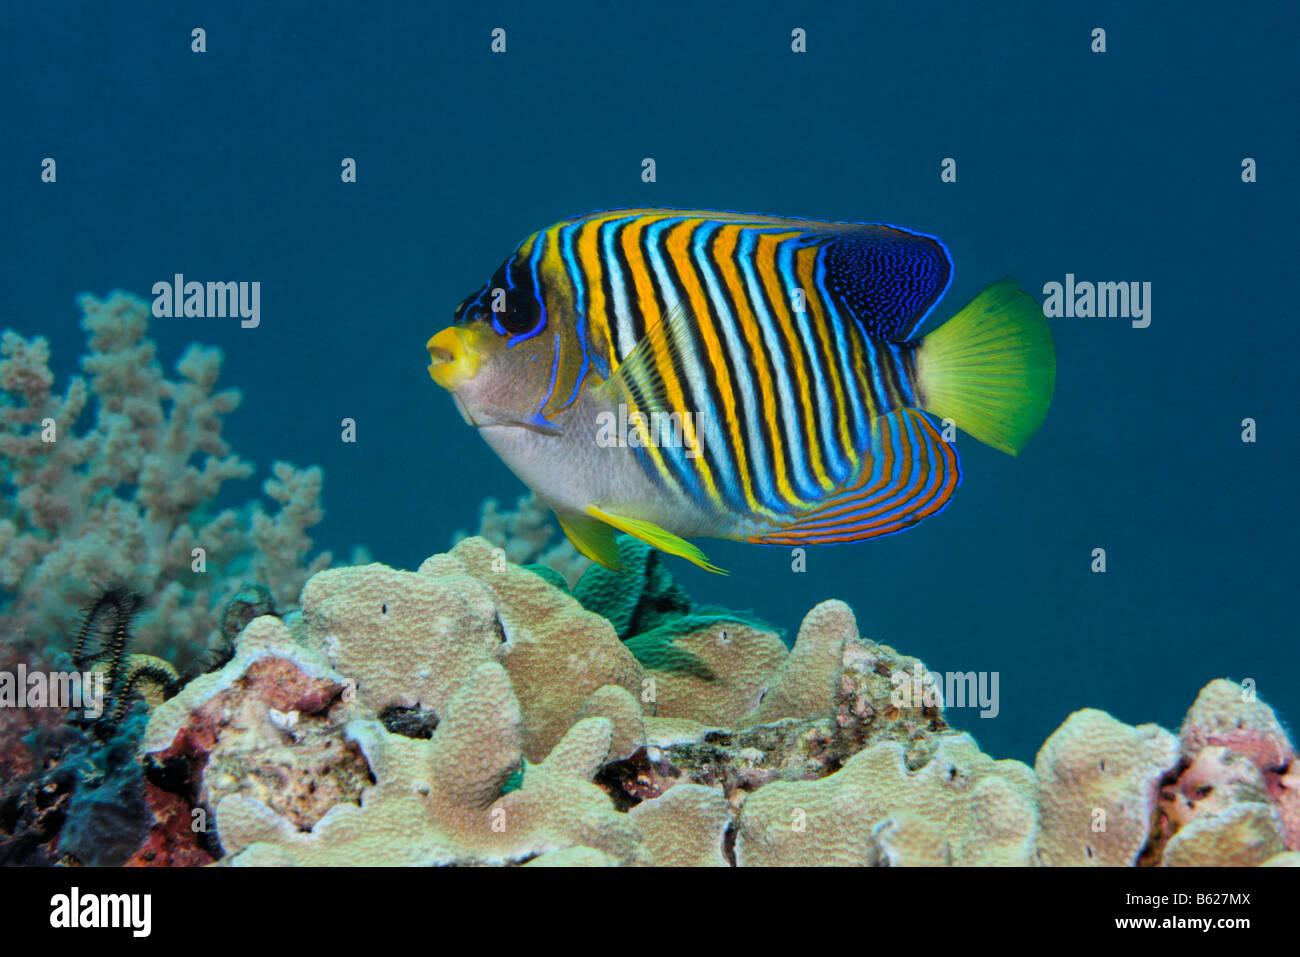 Königliche Kaiserfisch (Pygoplites Diacanthus), Korallen-Riff, Selayar Island, West Coast, Süd-Sulawesi, Stockbild